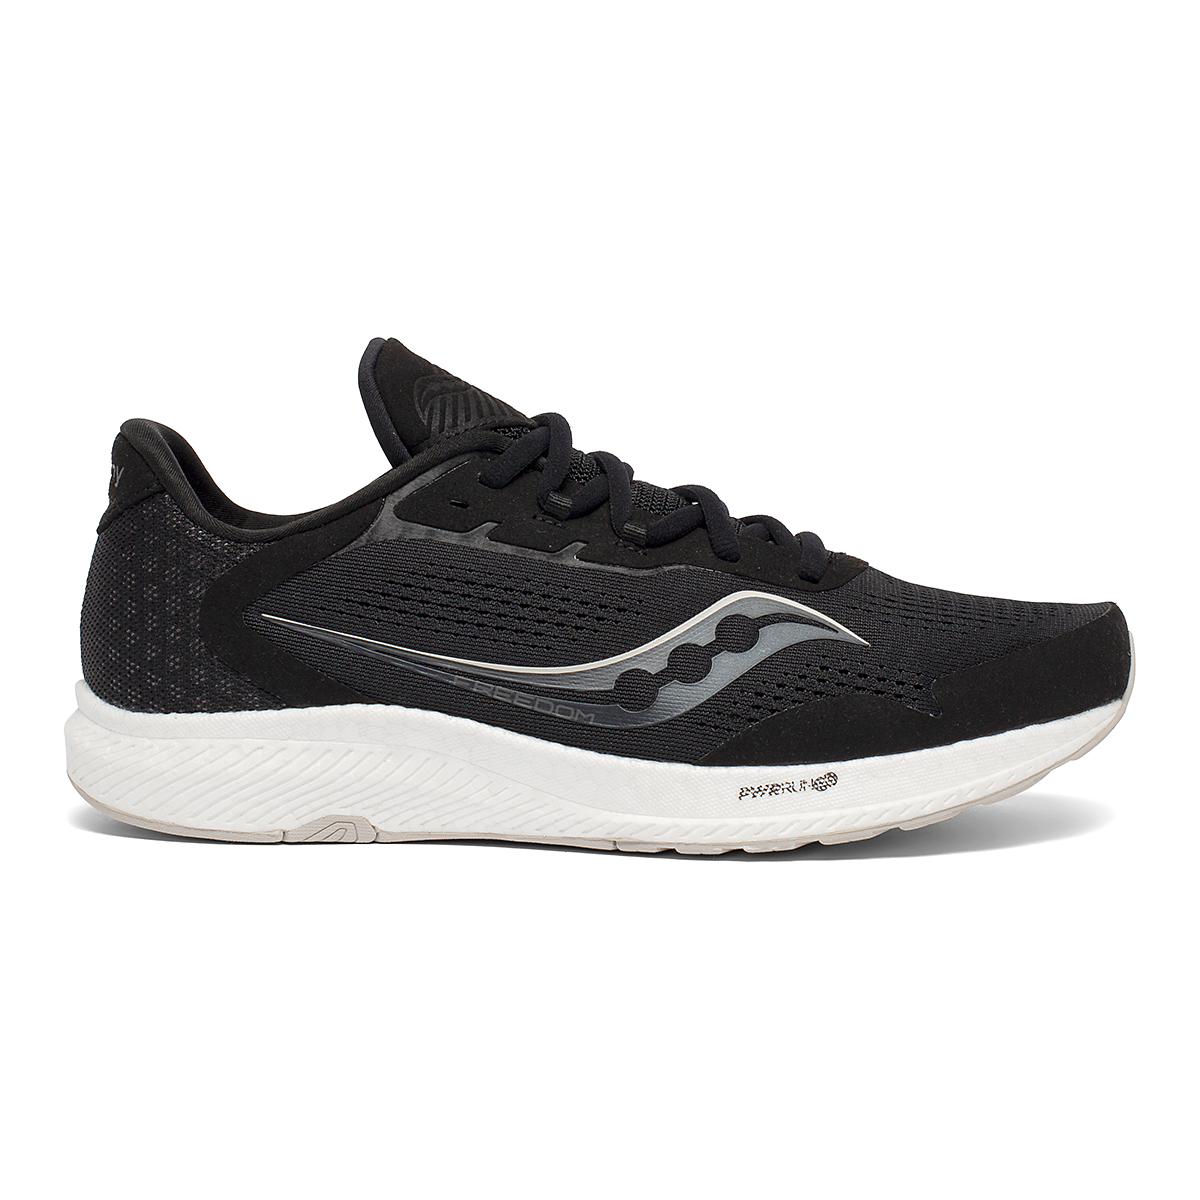 Men's Saucony Freedom 4 Running Shoe - Color: Black/Stone - Size: 7 - Width: Regular, Black/Stone, large, image 1